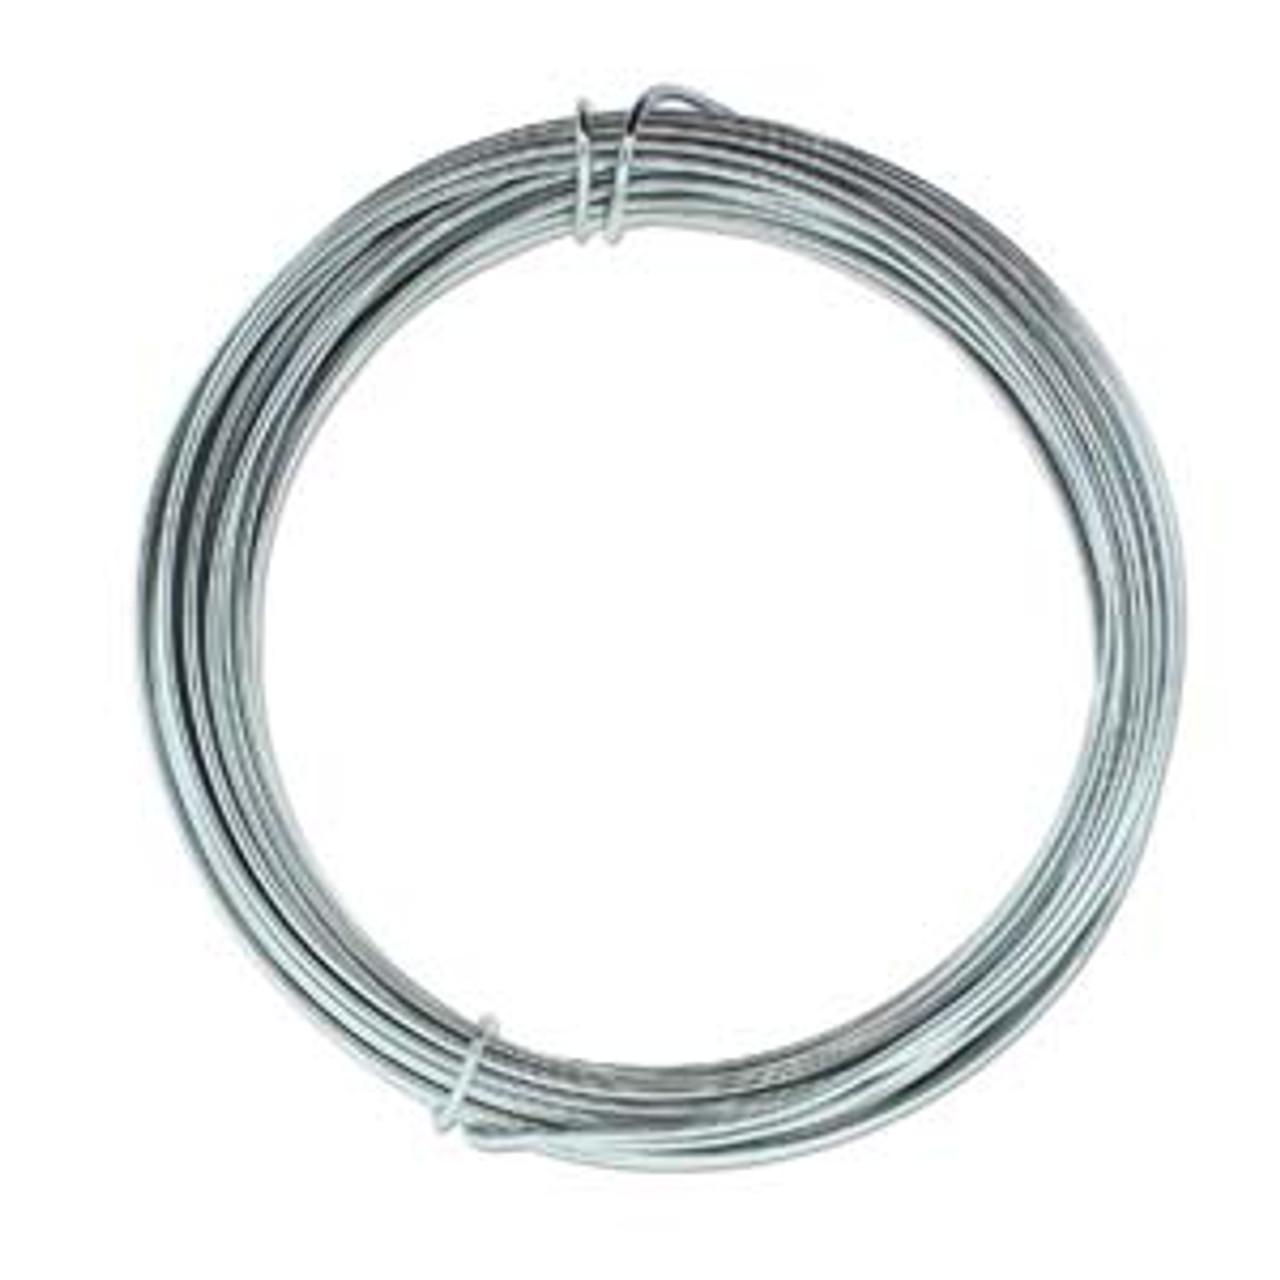 12ga Grey Aluminum Wire 39ft